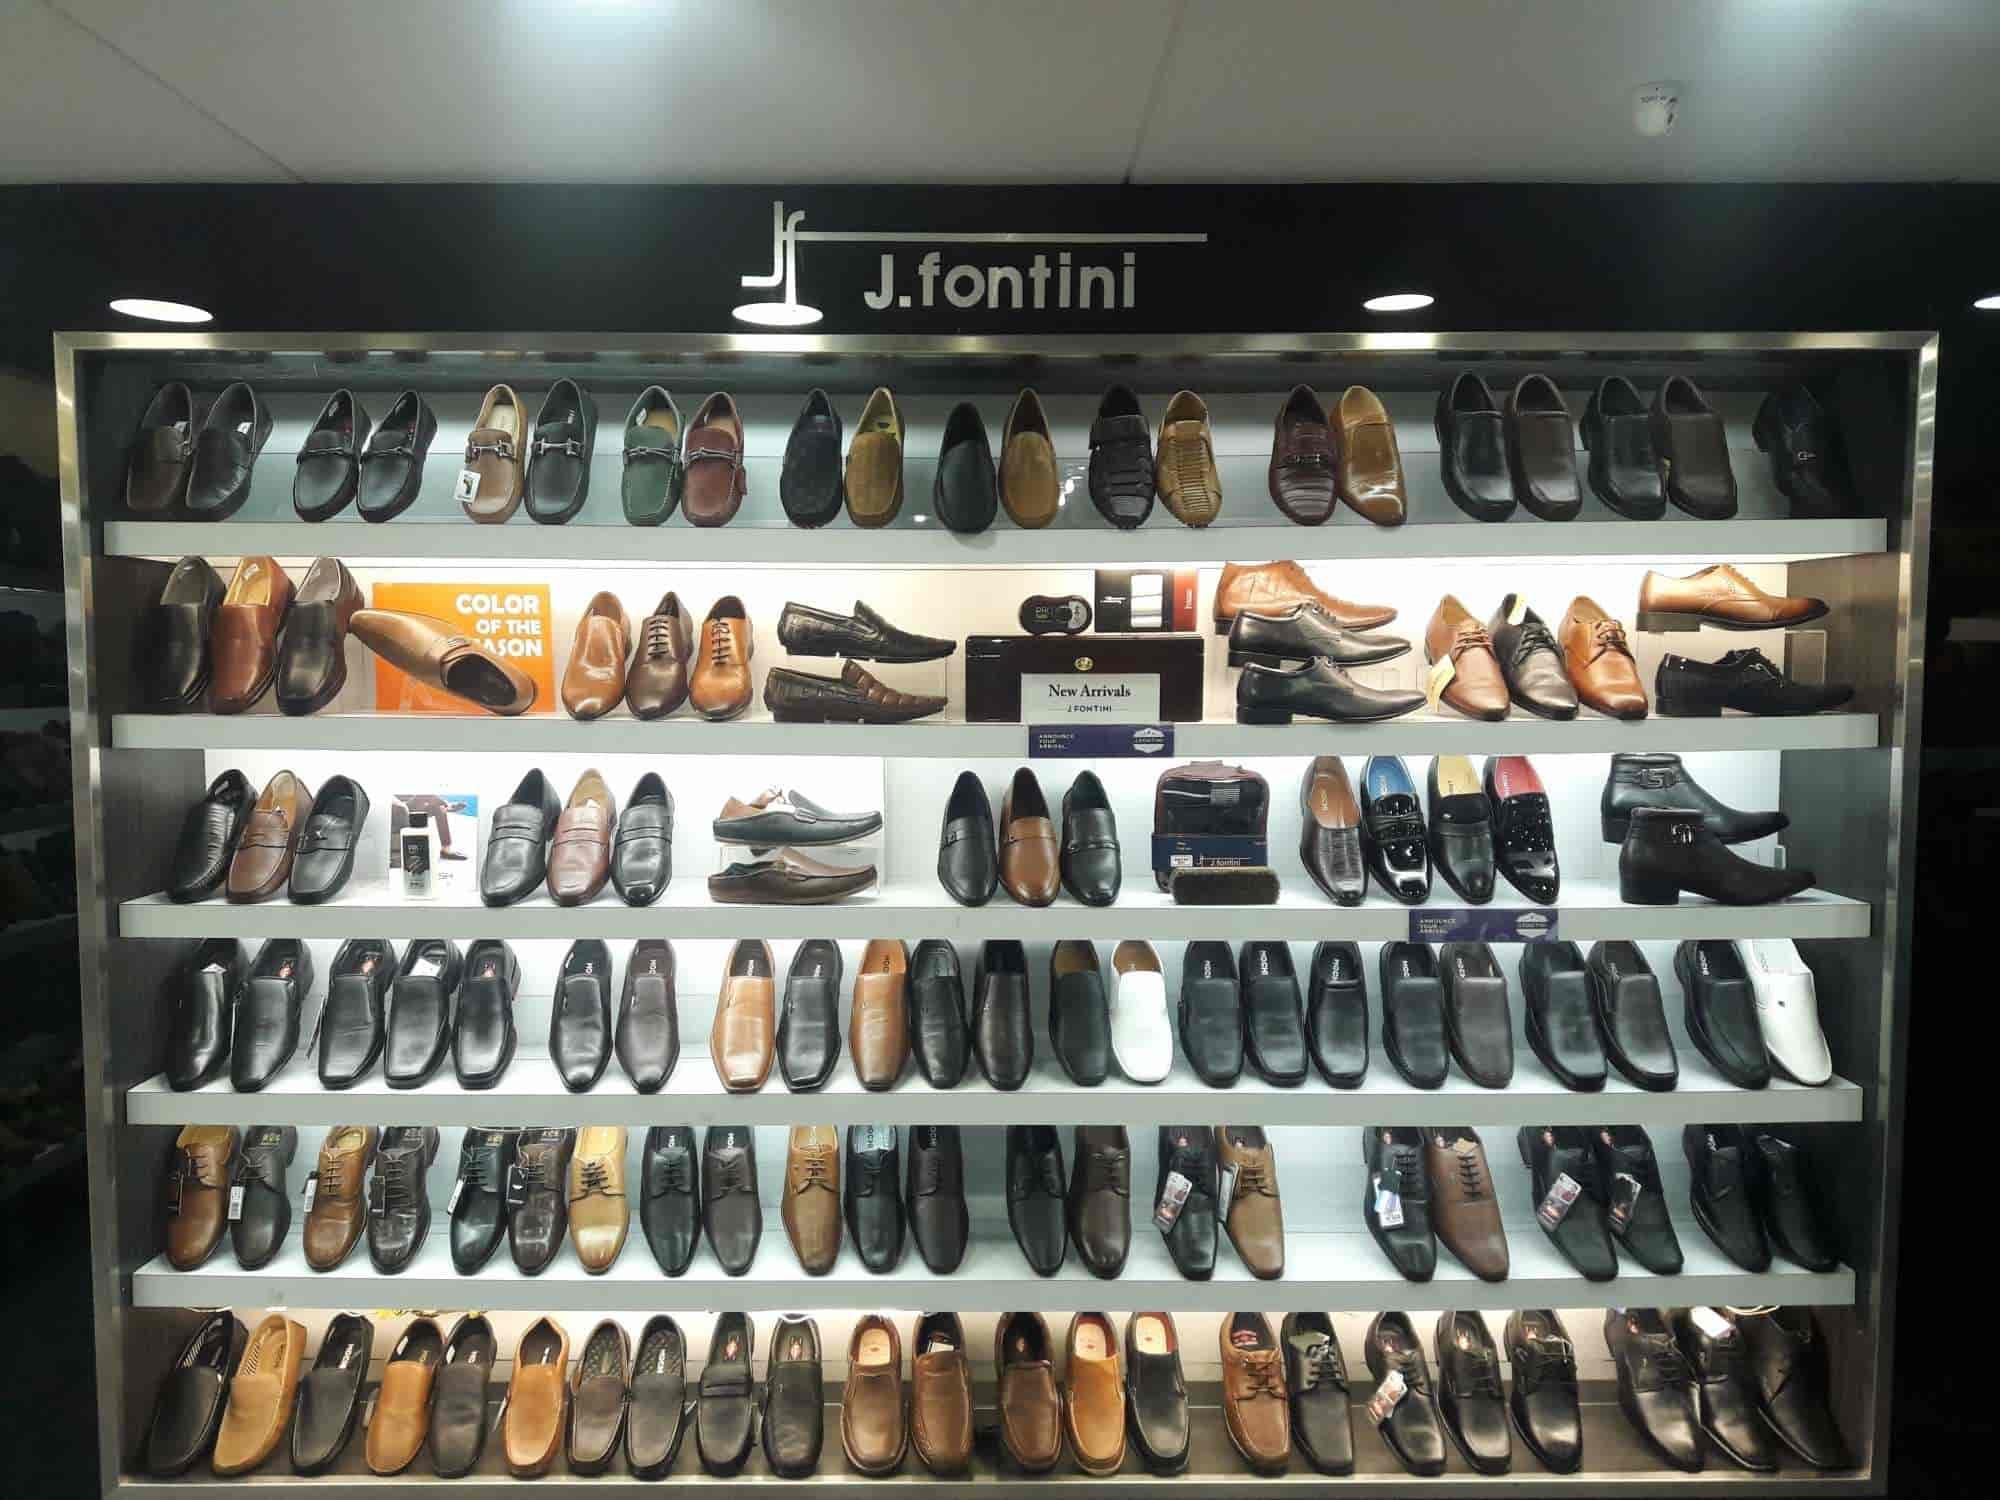 2bb963a910c ... Footwear Items - Mochi The Shoe Shoppe Photos